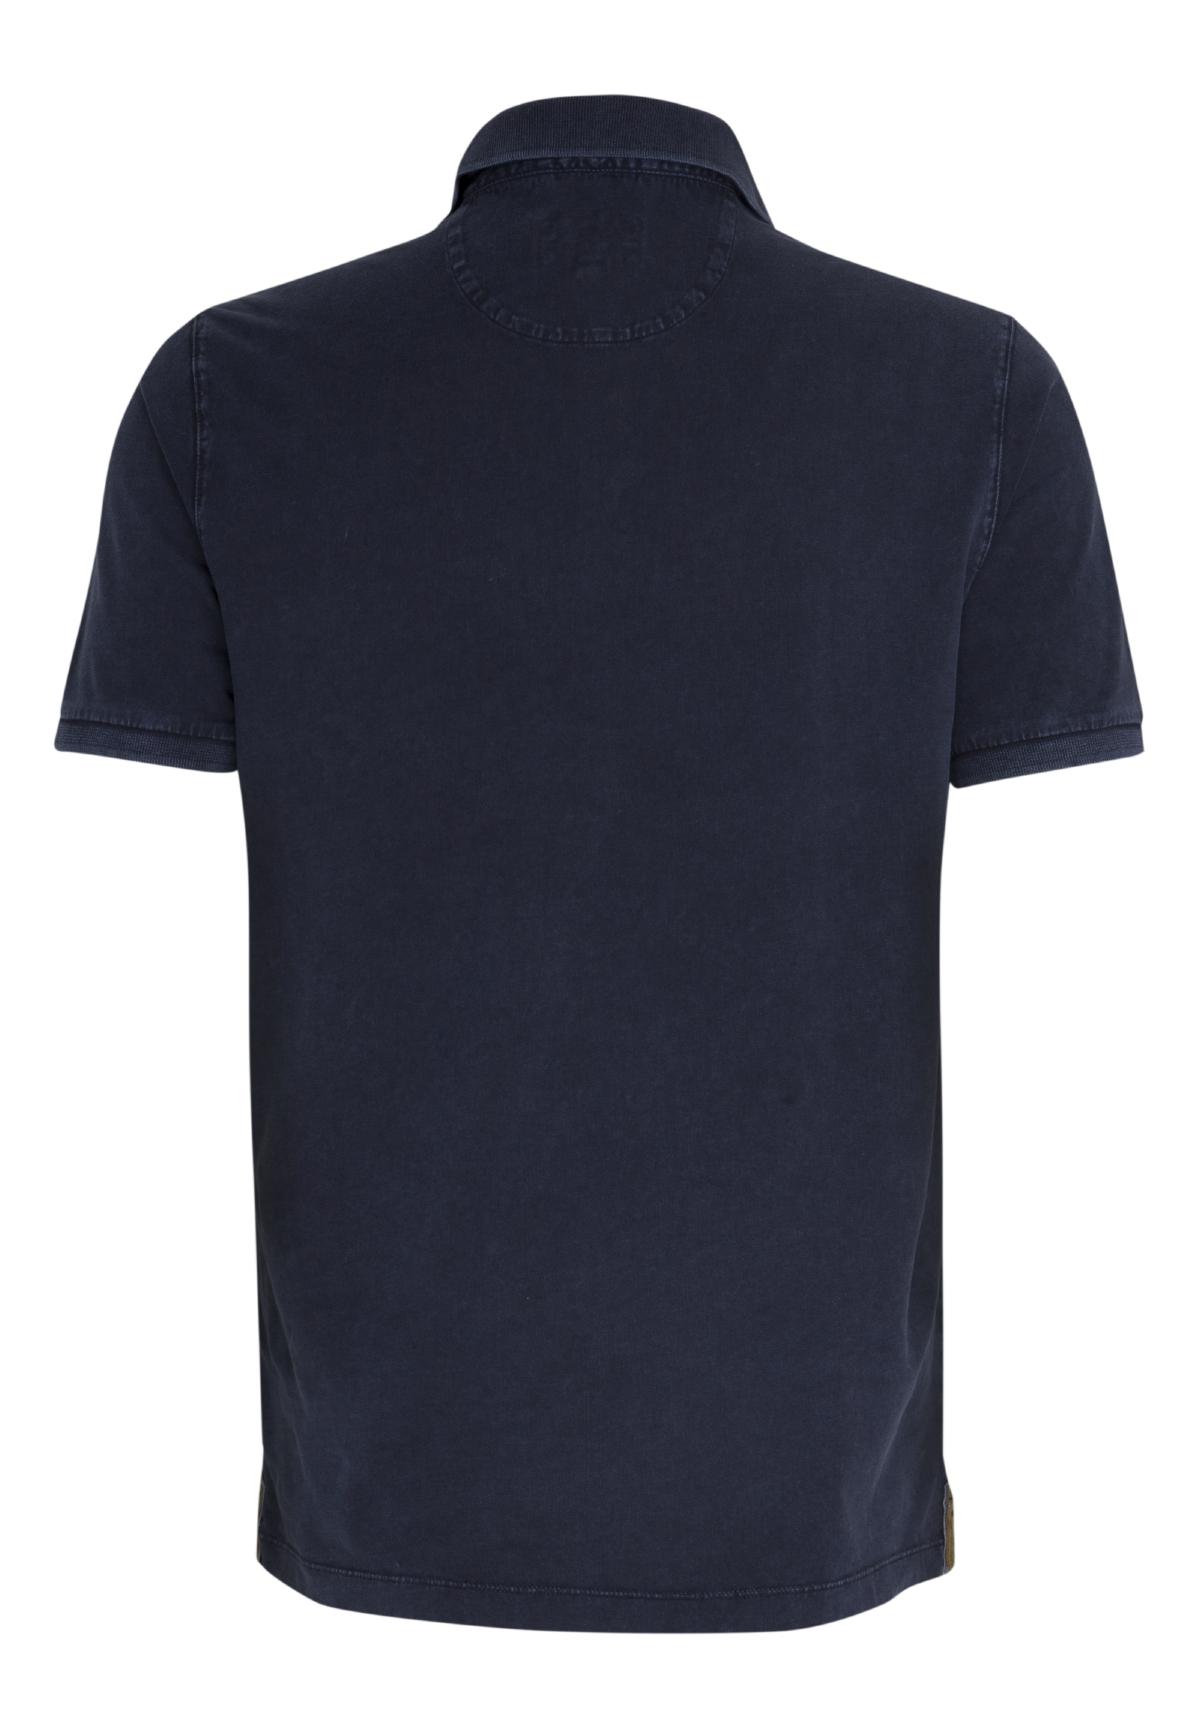 Camel-Active-Herren-Shirt-Poloshirt-Pique-Regular-Fit-NEU Indexbild 33